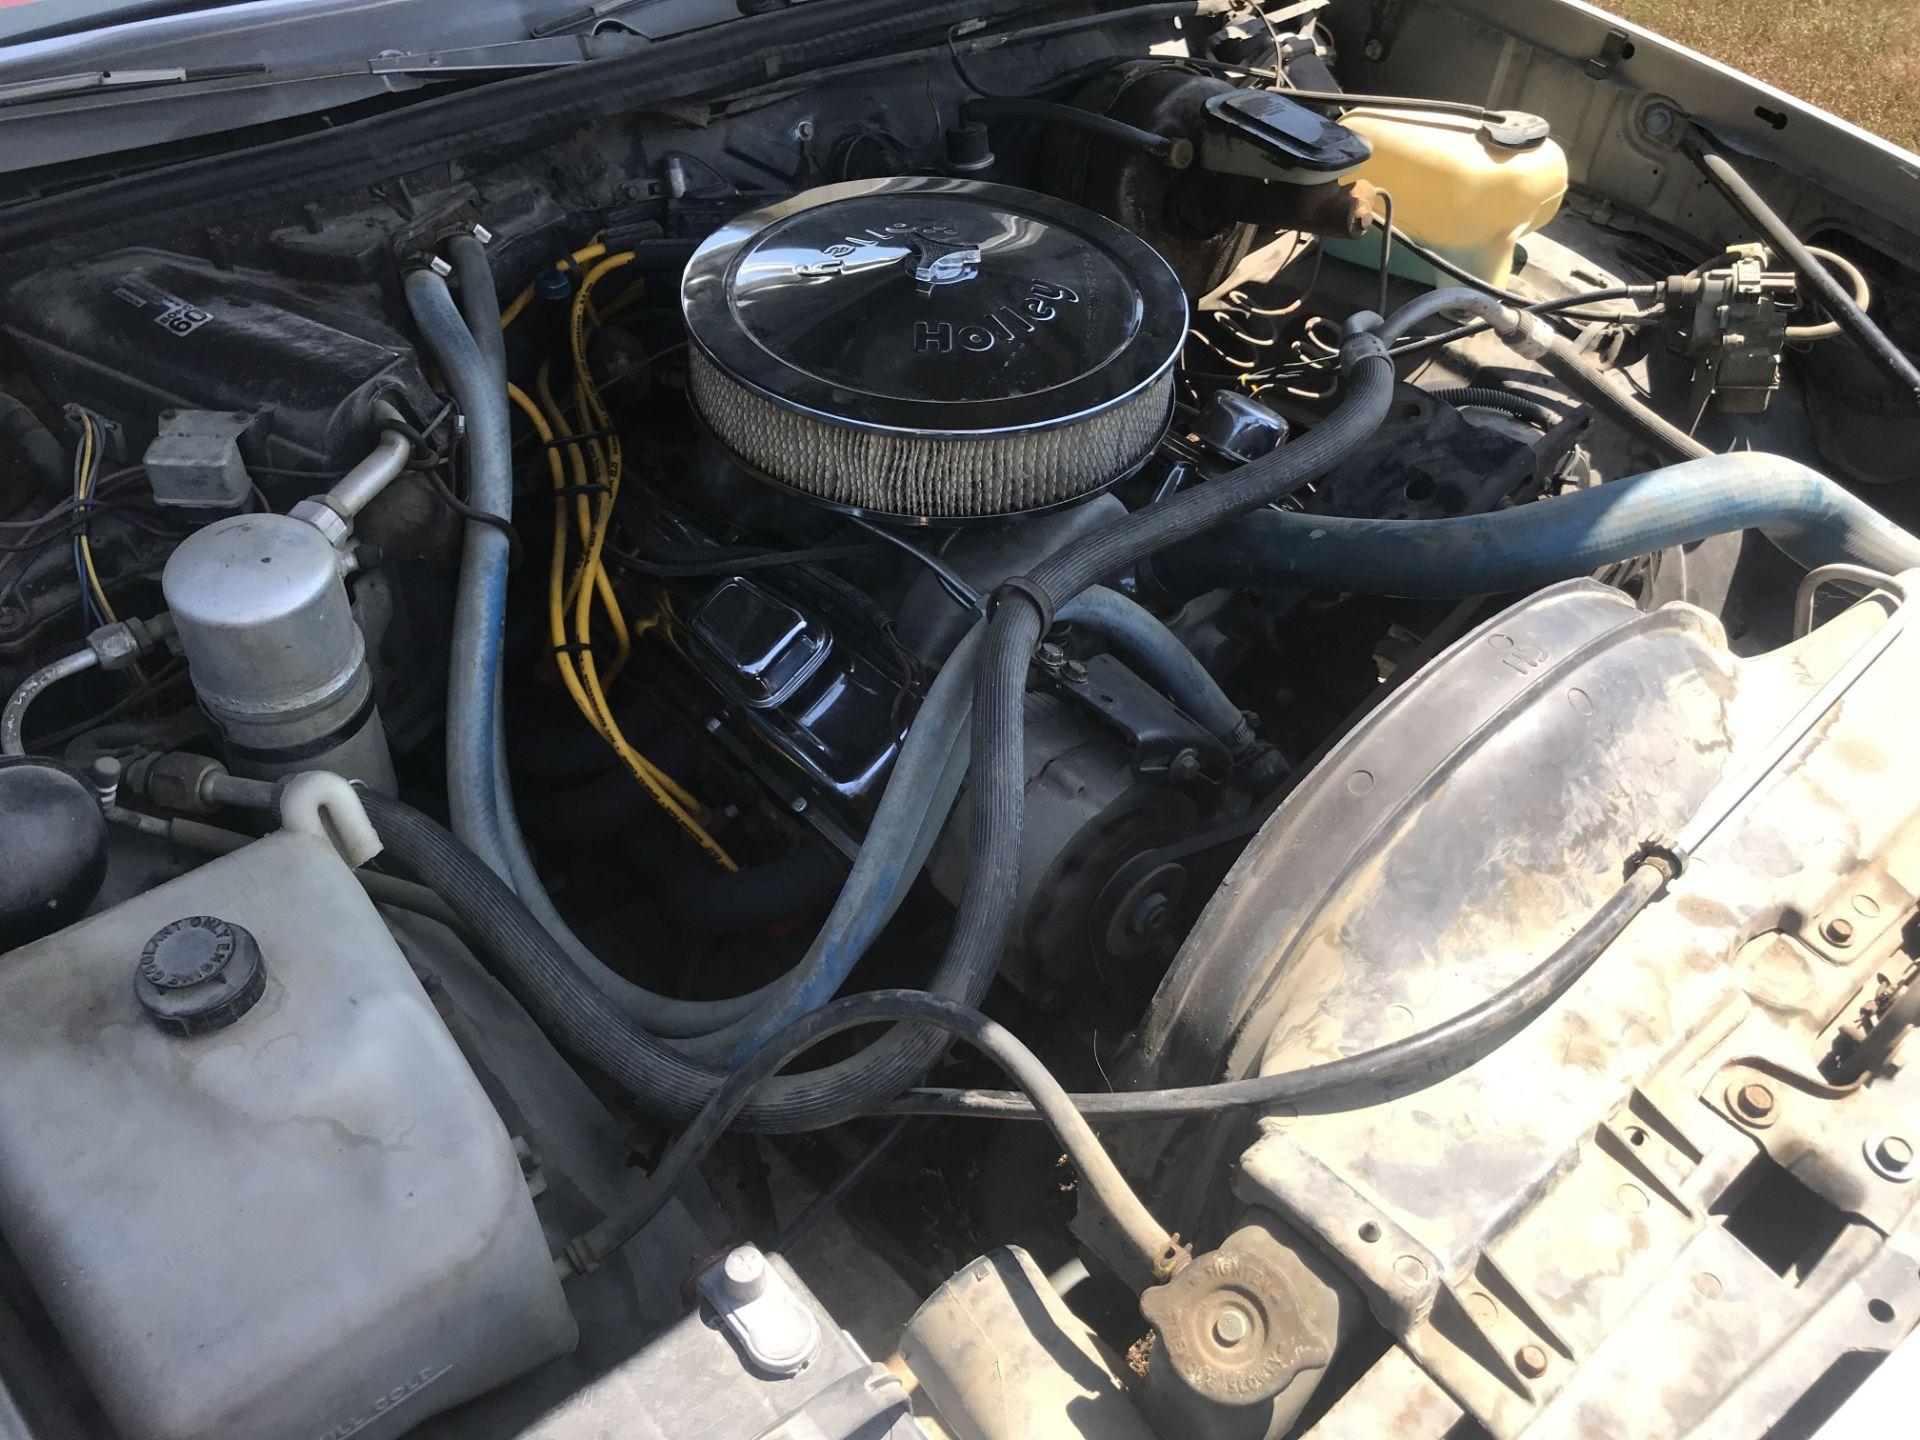 Lot 26 - 1979 Oldsmobile Cutlass Calais 2dr, Rebuilt 350 V-8, 350 Turbo Auto w/Floor Shift, 750 Holly 4v,